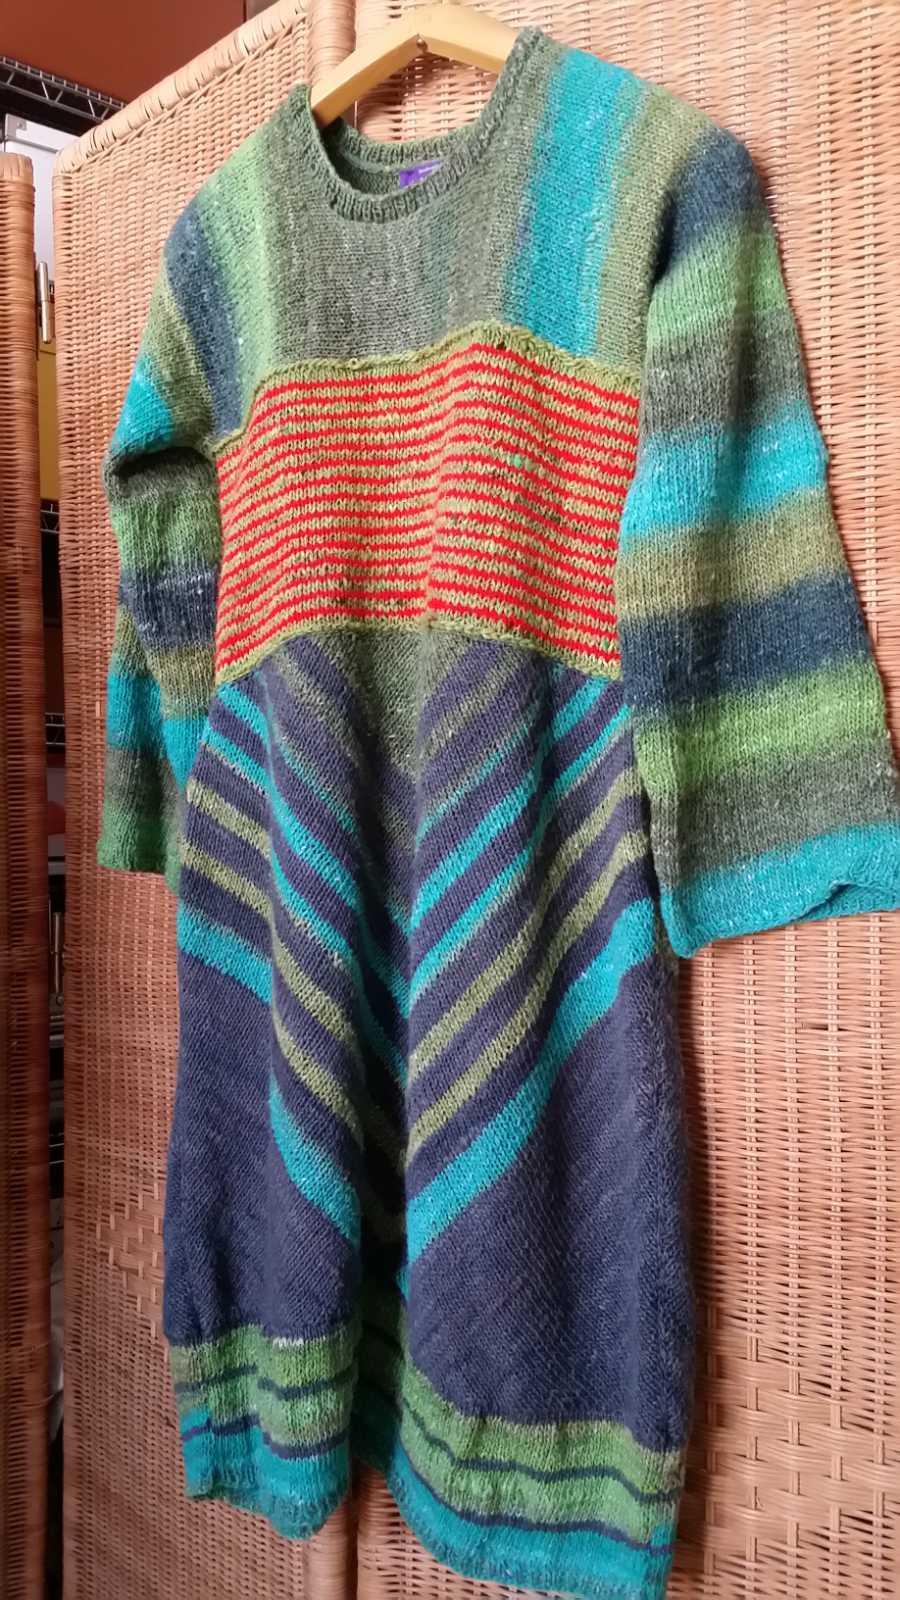 Das Strickkleid aus Noro Geshi, Noro Sonata und Noro Silk Garden Sock Solo in voller Pracht. Foto: Katrin Walter – Noromaniac